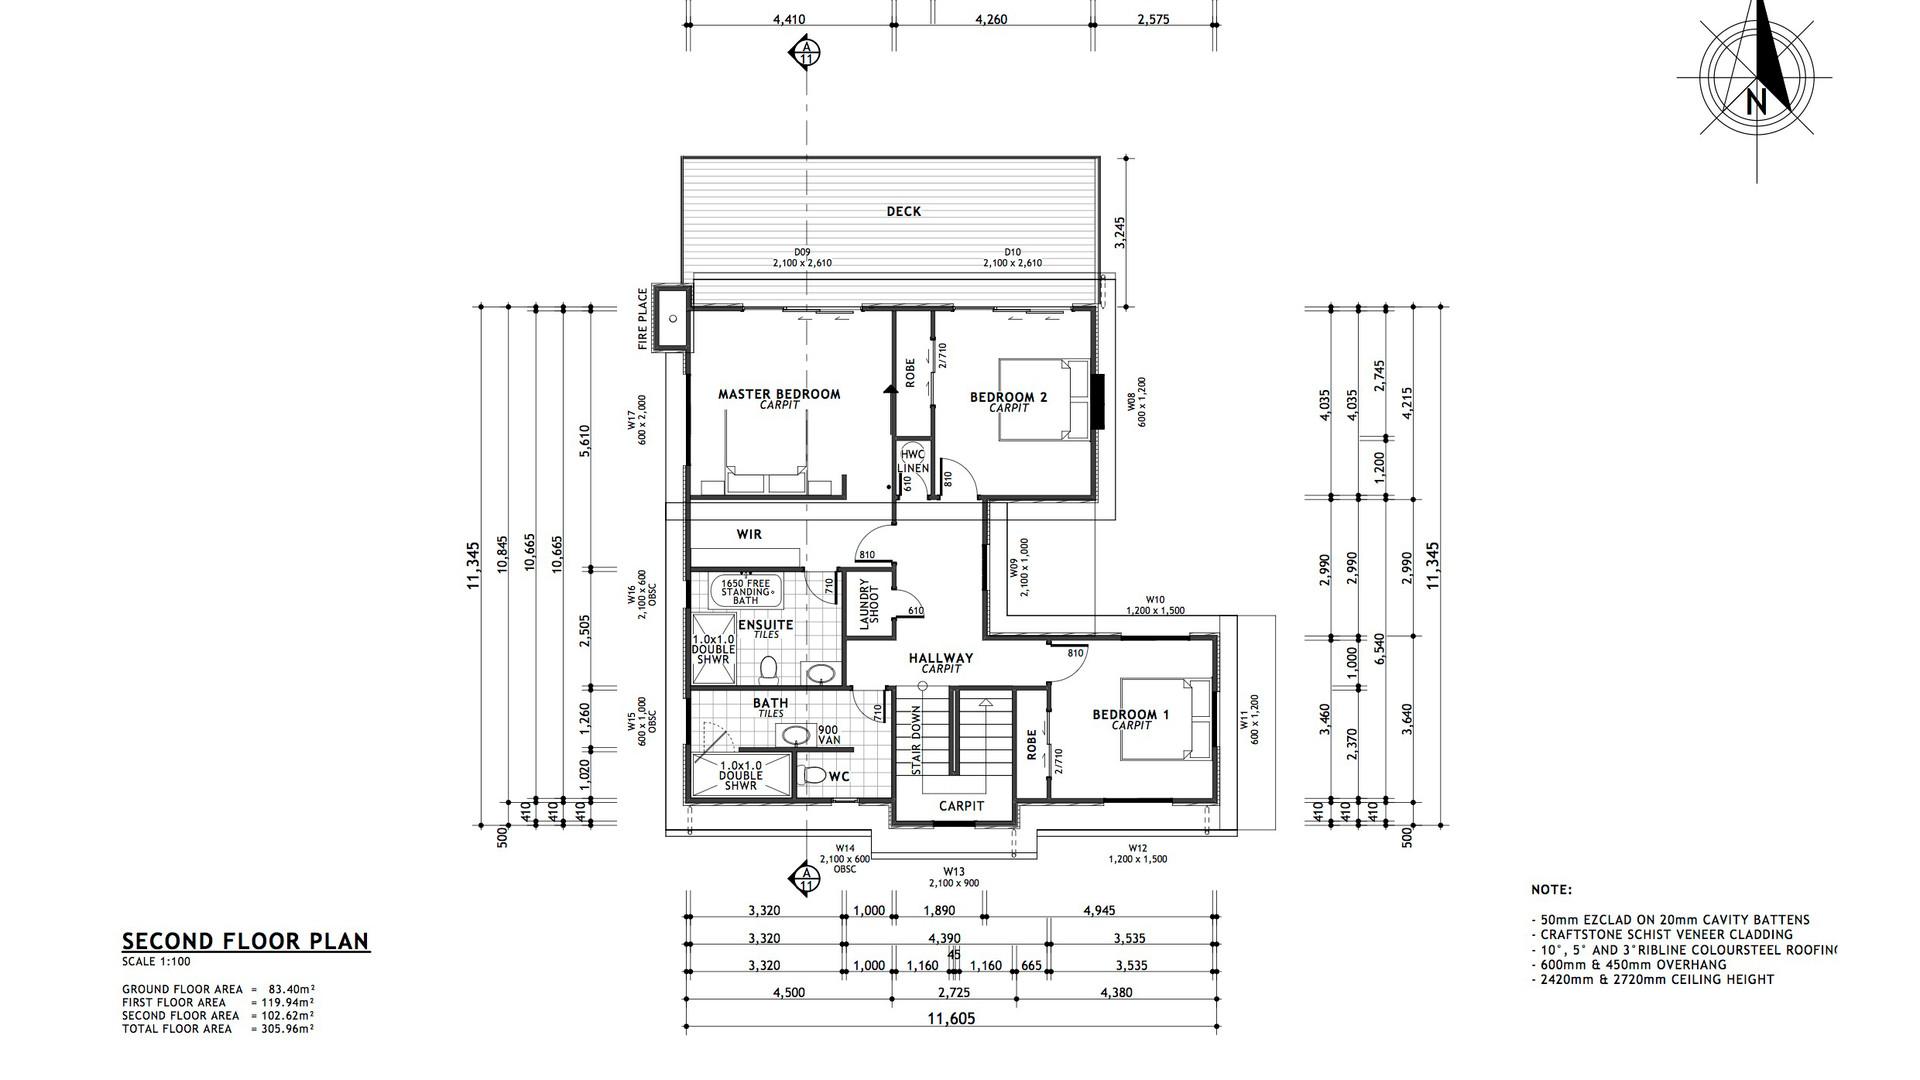 Westmorland second floor plan